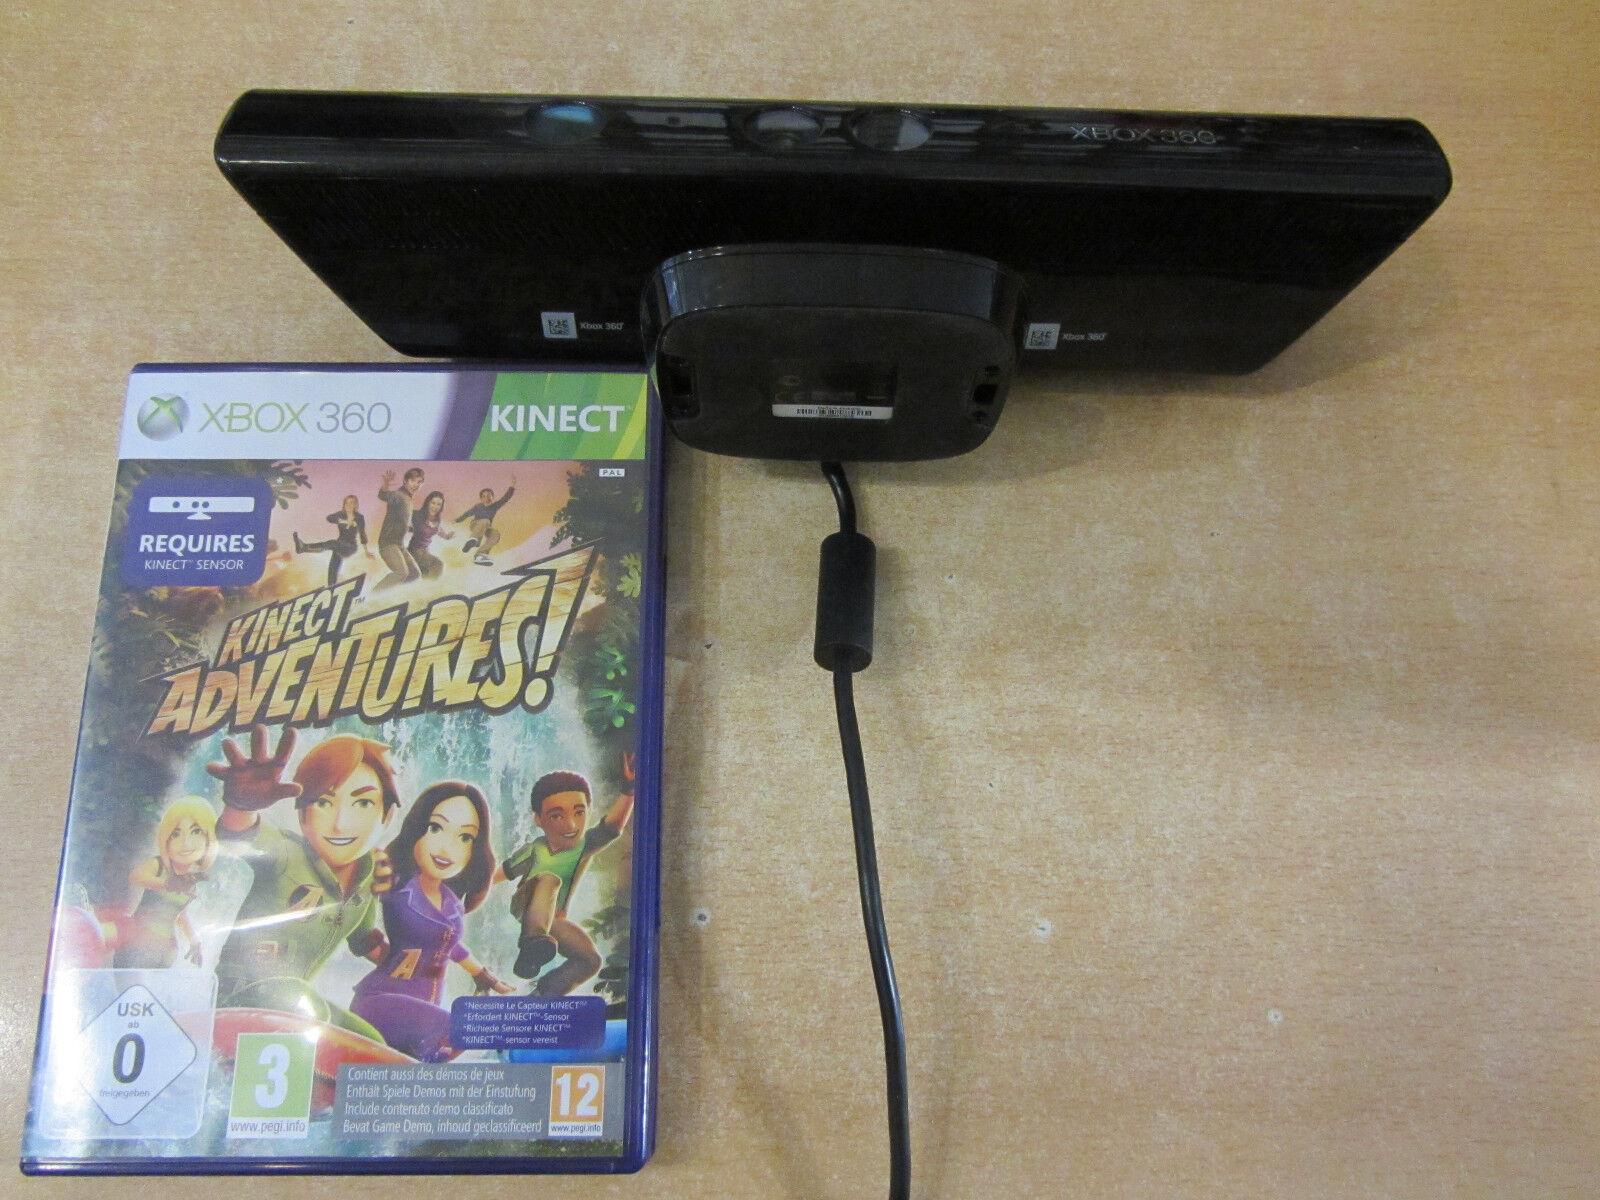 Microsoft Kinect Sensor Kamera für XBOX 360 + Adventures Game Activ Sport Spiel